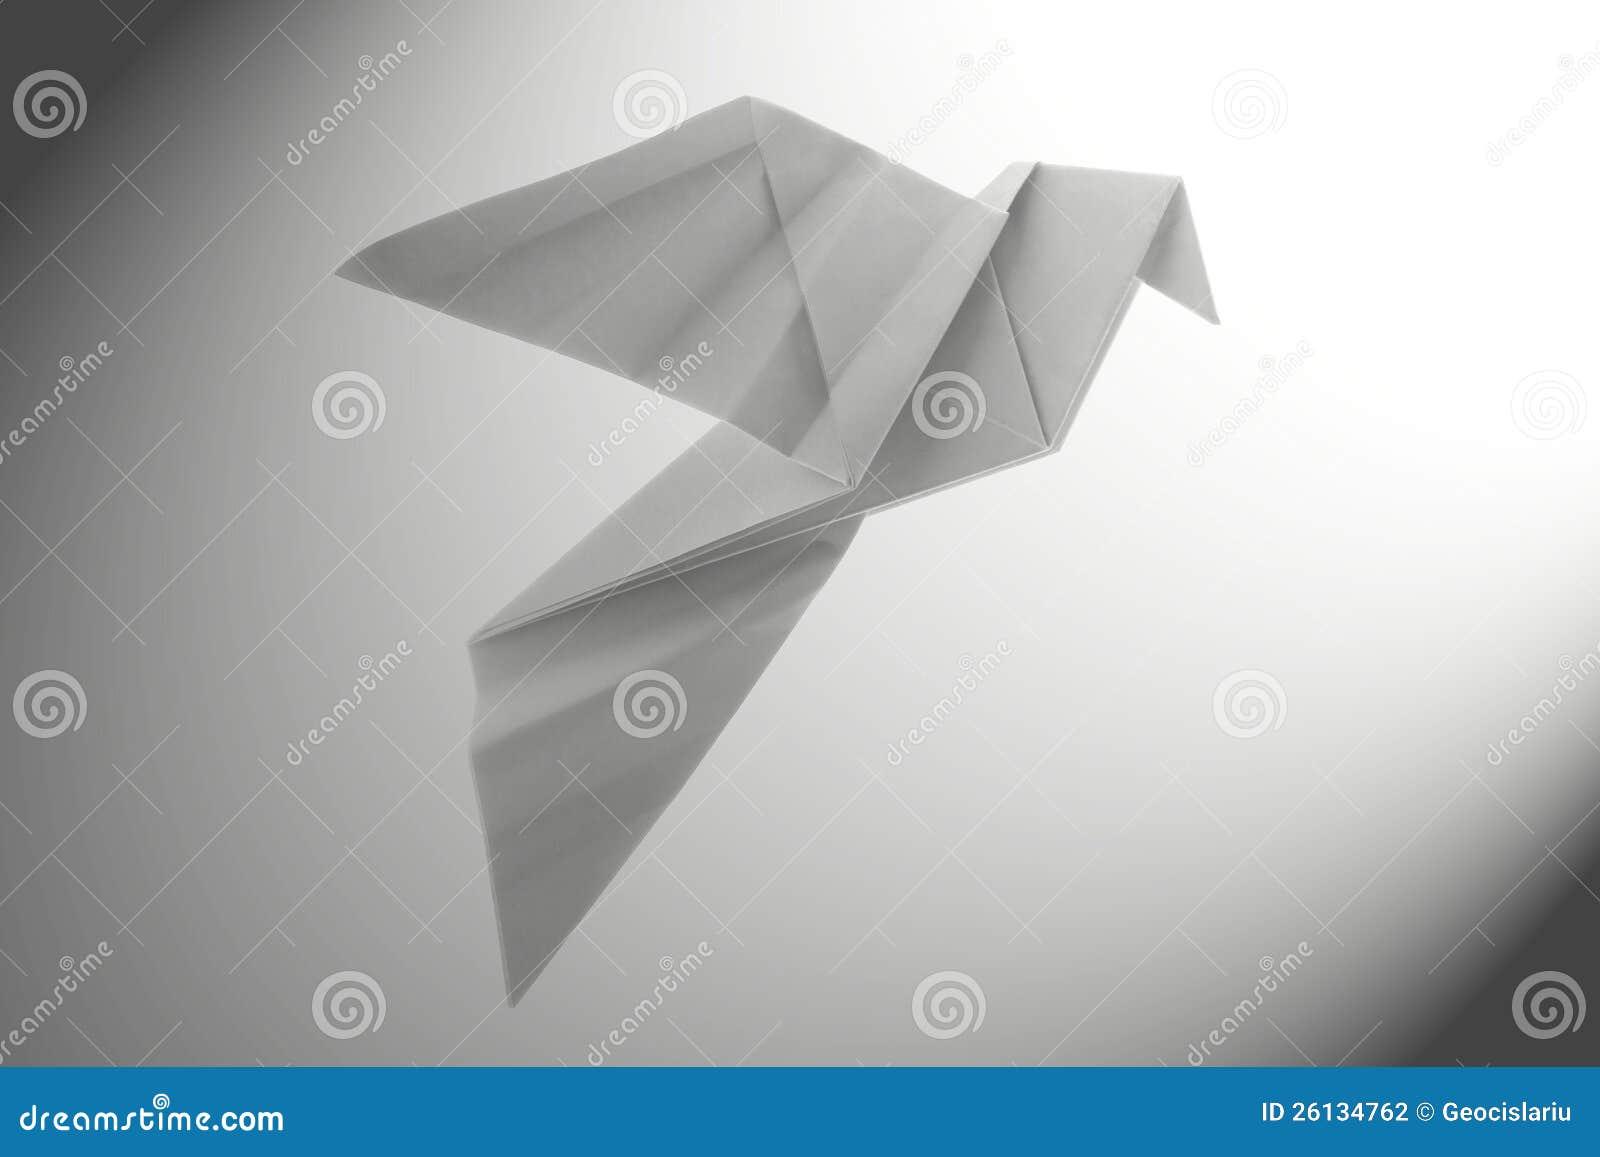 Peace Dove Origami Stock Photography - Image: 26134762 - photo#26